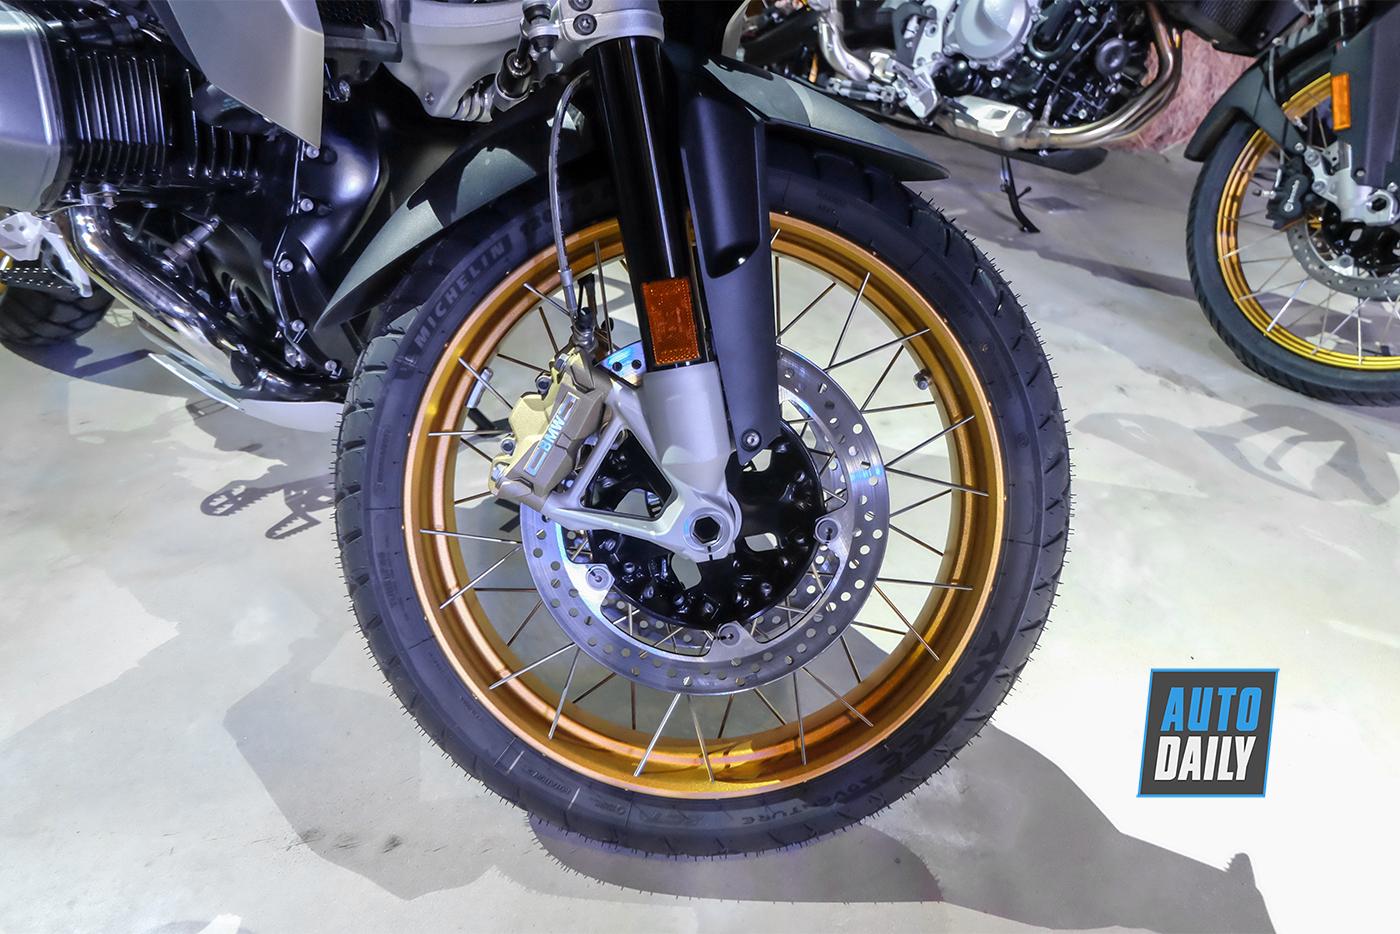 bmw-motorrad-r-1250-gs-2019-7.jpg